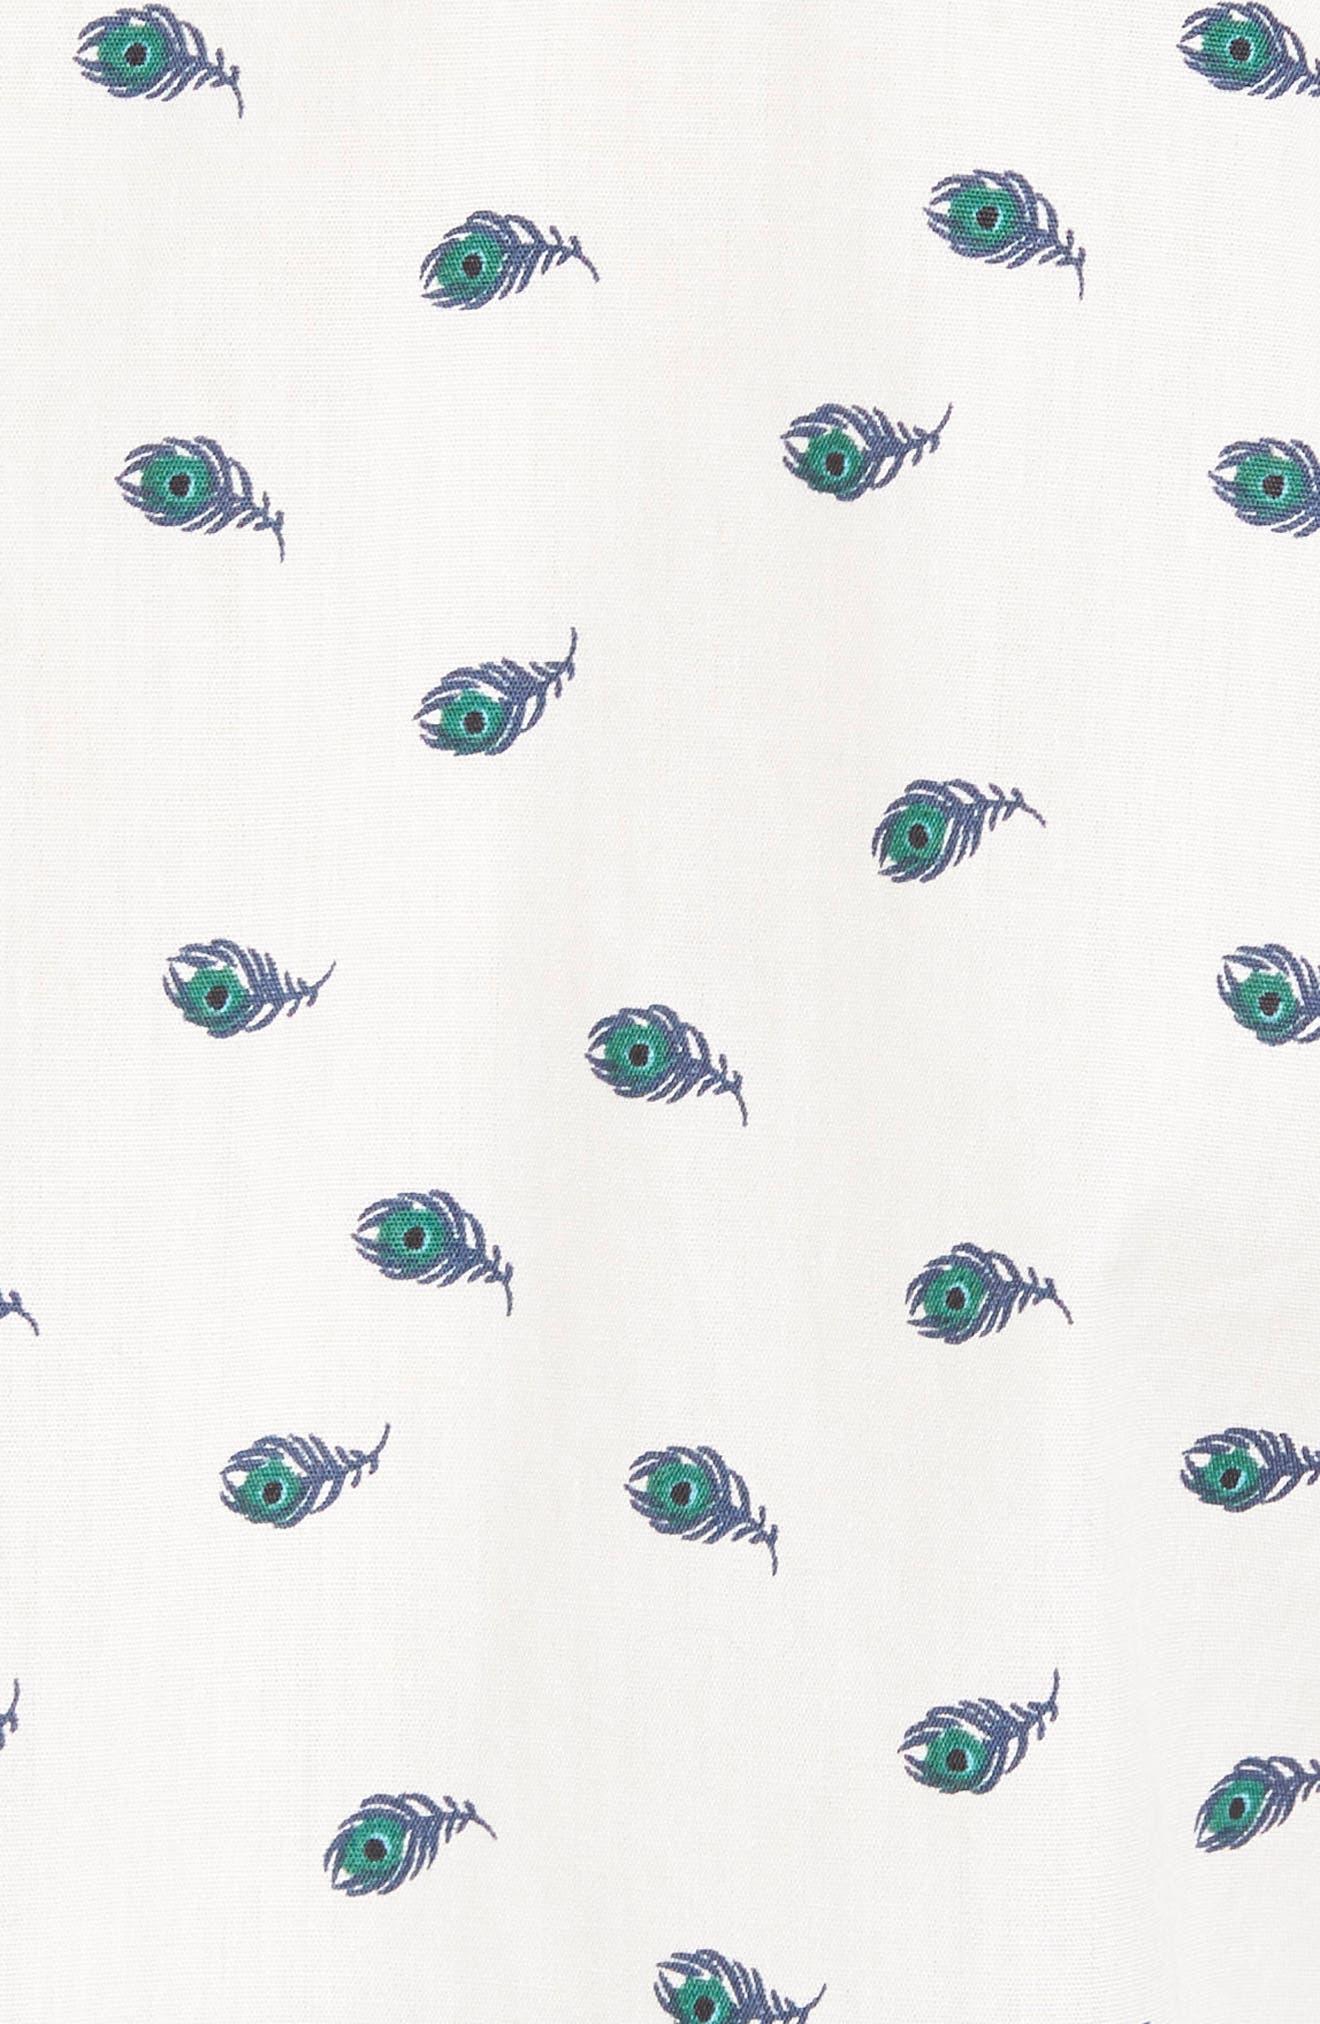 Peacock Feather Woven Shirt,                             Alternate thumbnail 5, color,                             111